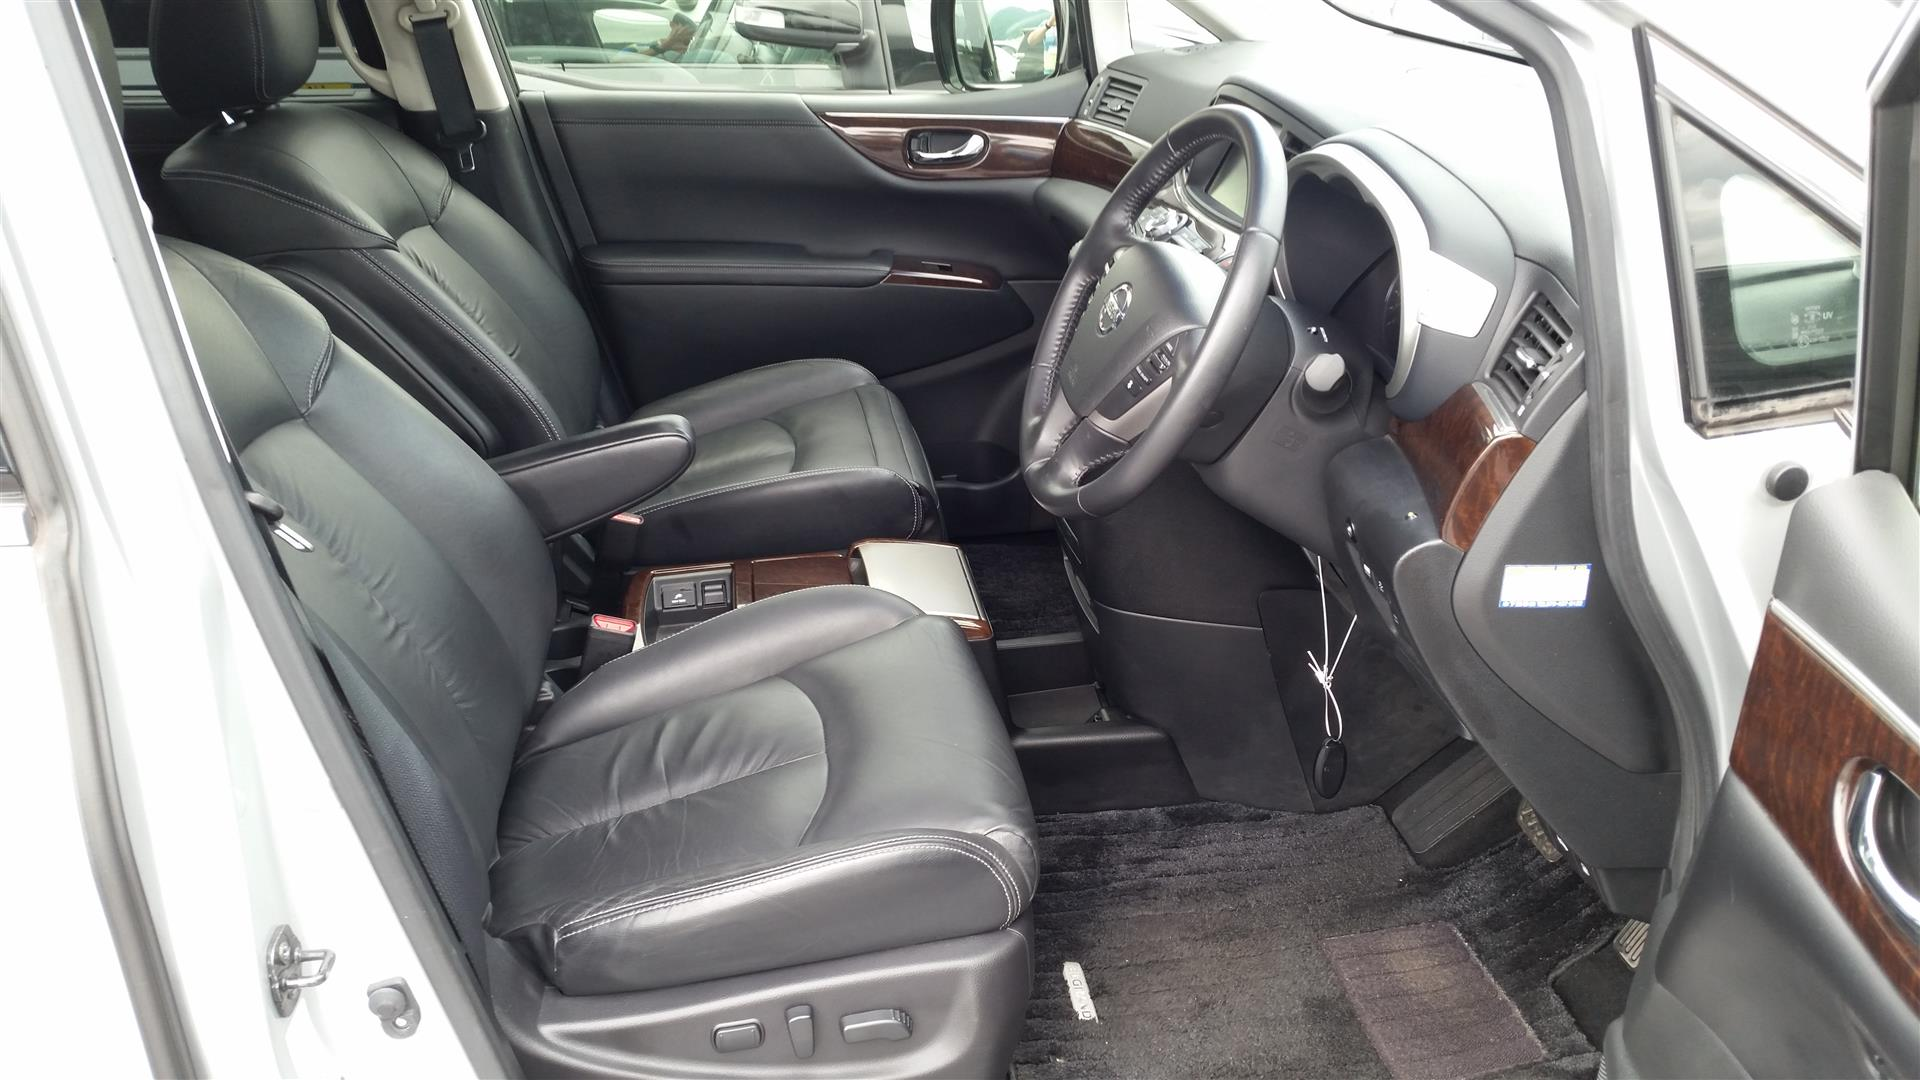 2012 Nissan Elgrand E52 20150627_143254 (Large)